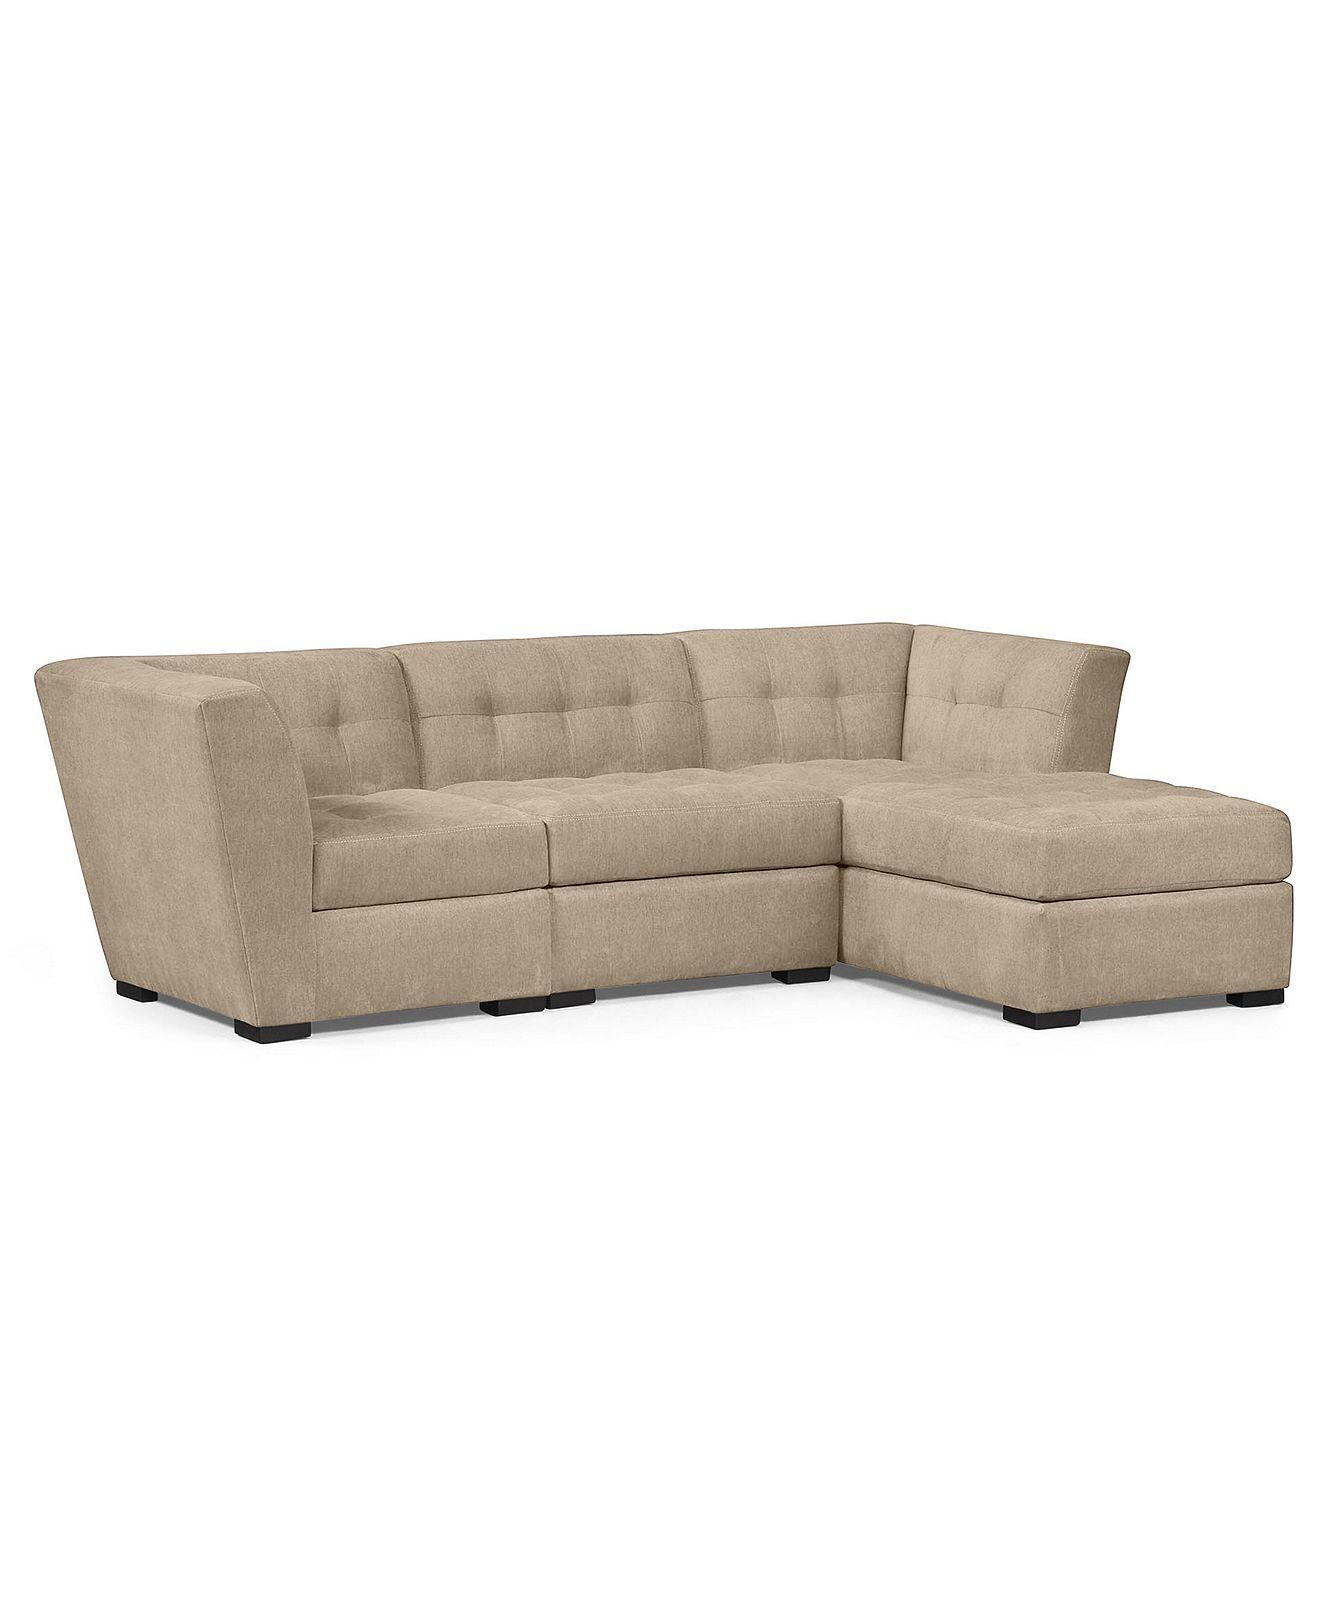 Mink Roxanne Fabric Modular Sectional Sofa 3 Piece